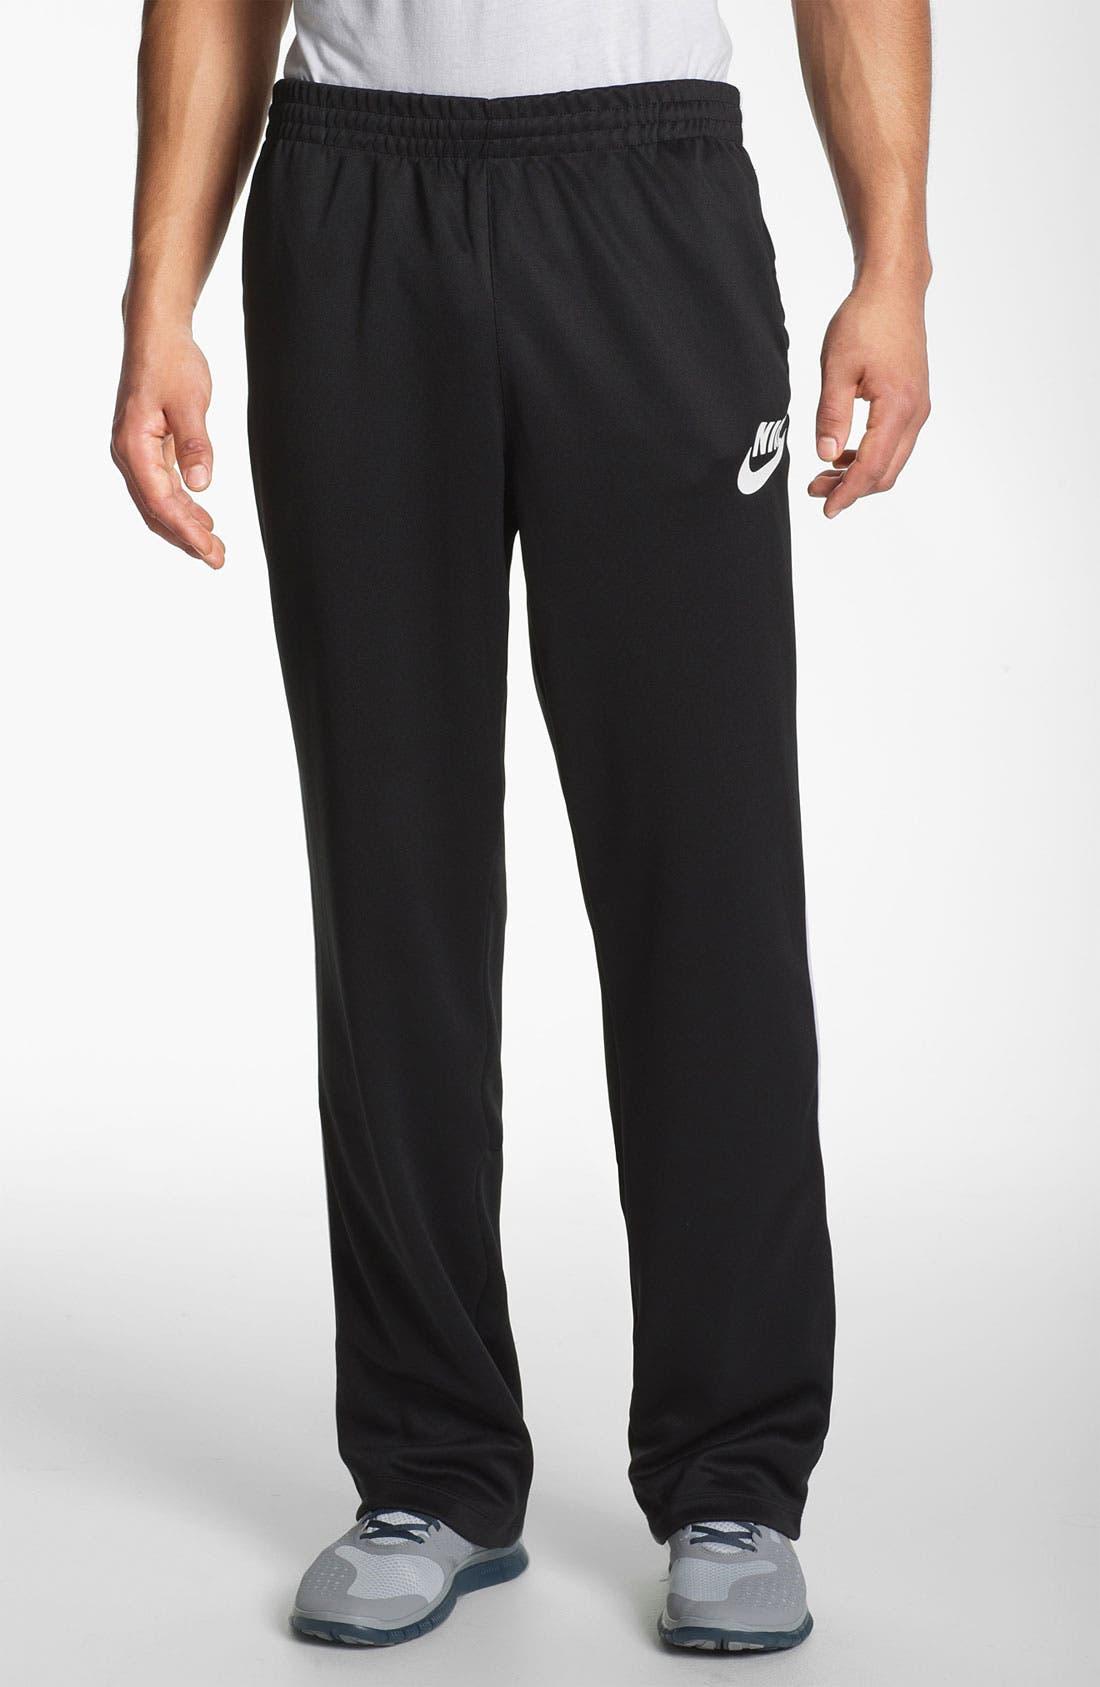 Main Image - Nike 'HBR' Track Pants